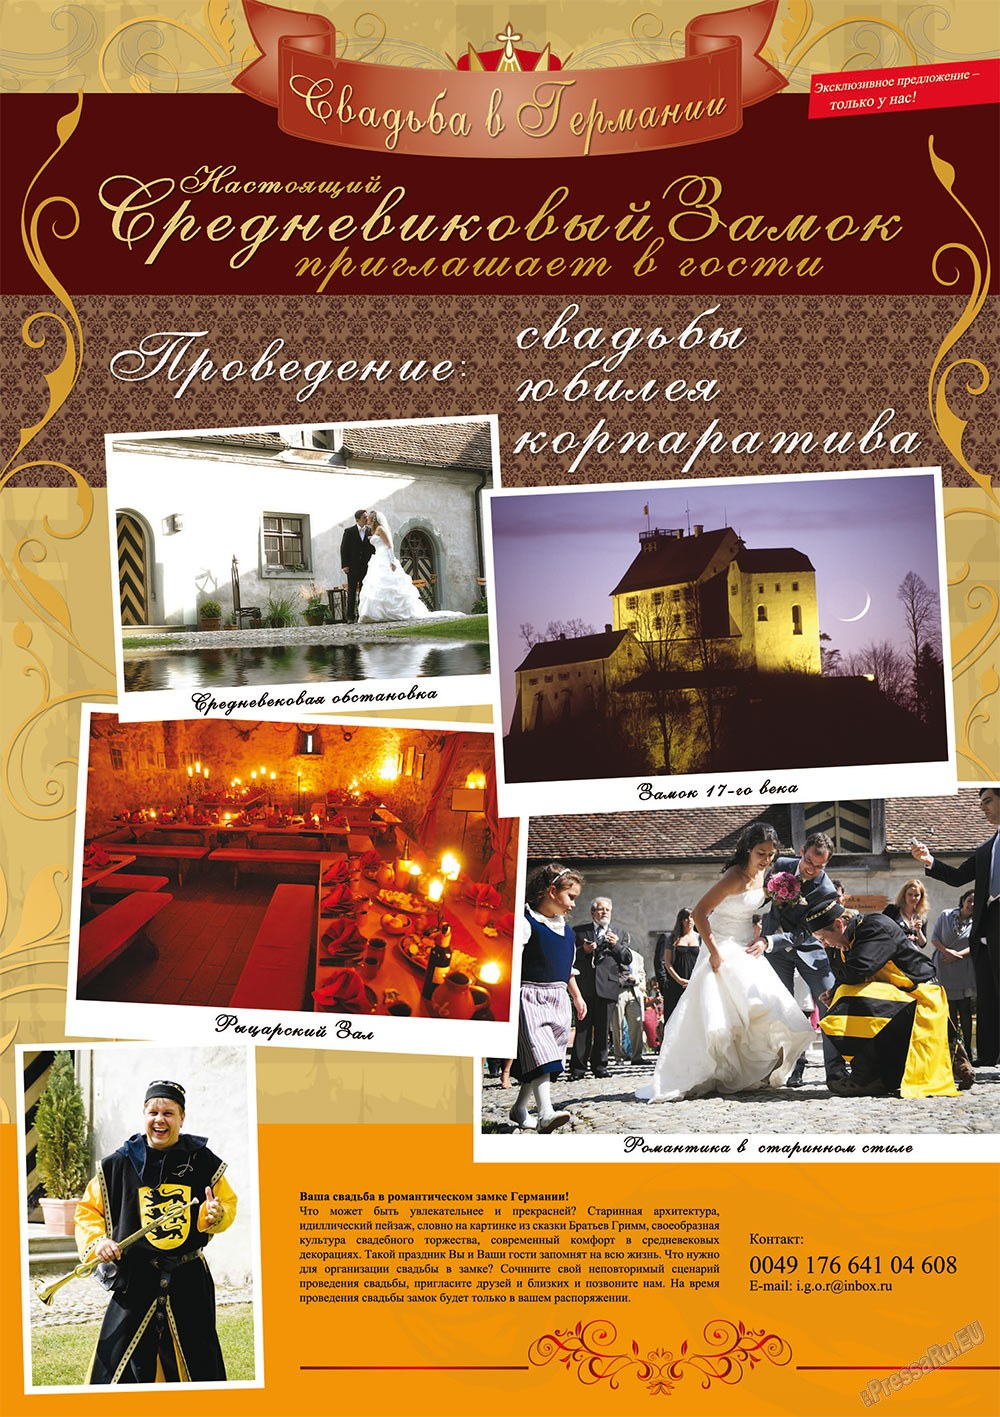 Бизнес парк (журнал). 2011 год, номер 4, стр. 23